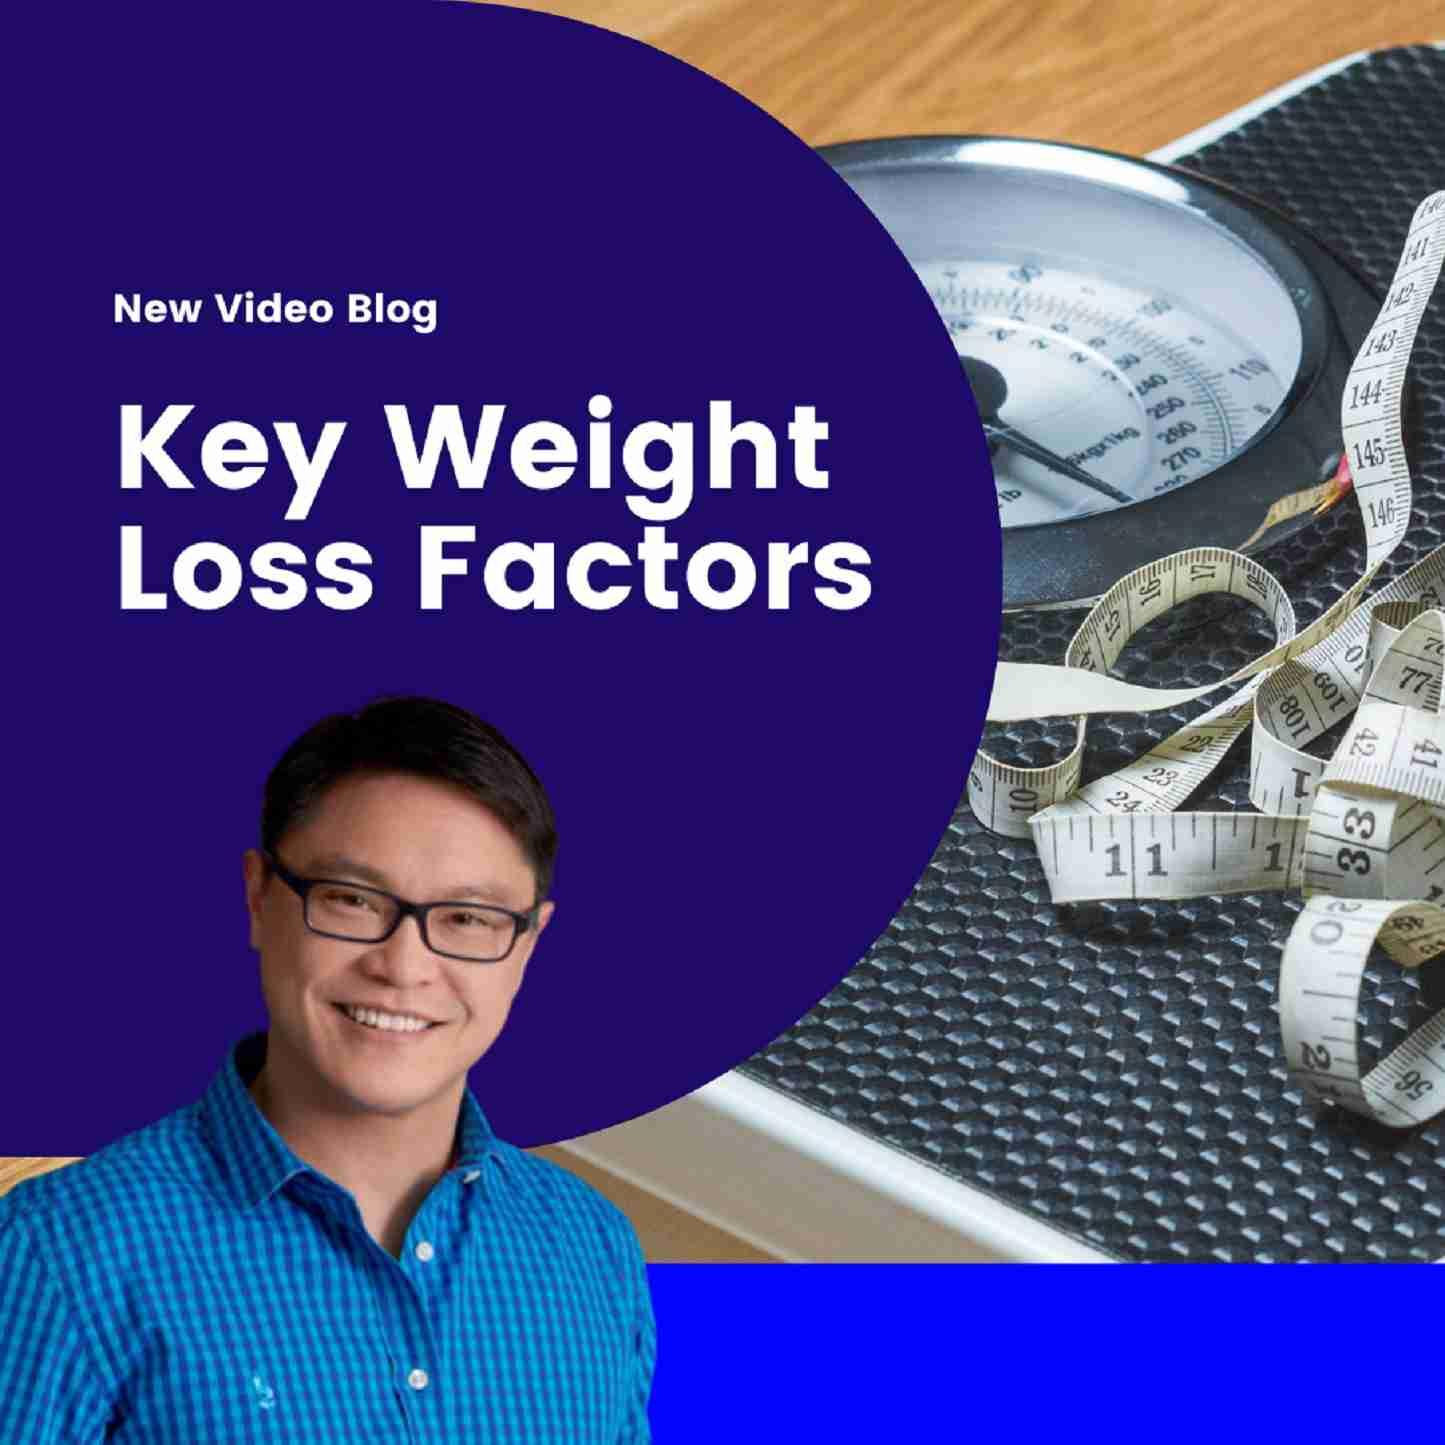 Key Weight Loss Factors